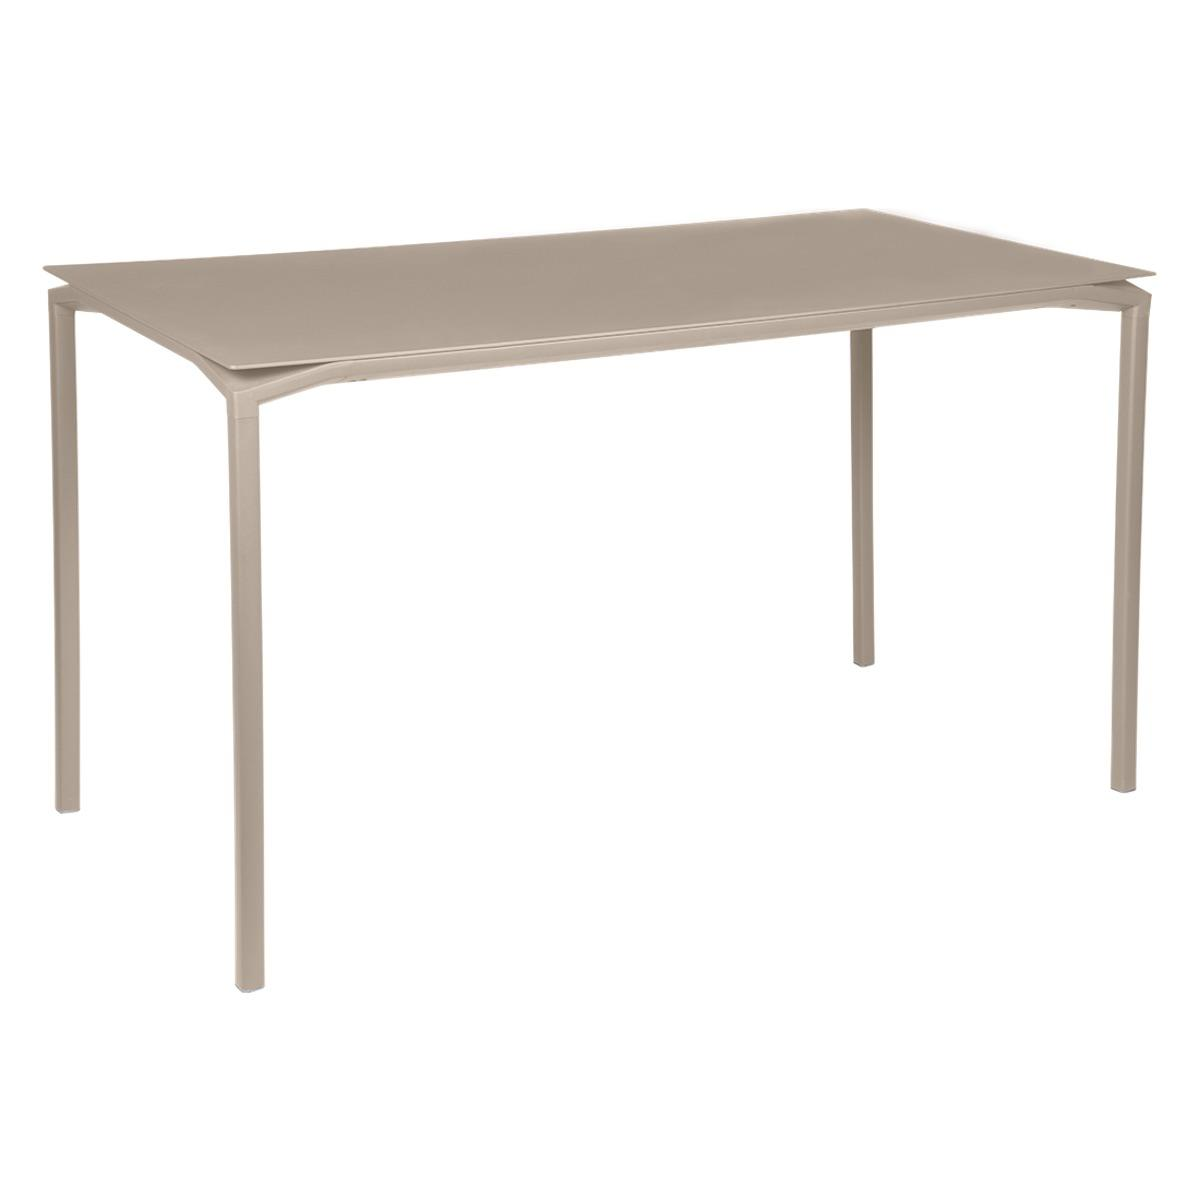 Table 80x160cm CALVI Fermob brun muscade